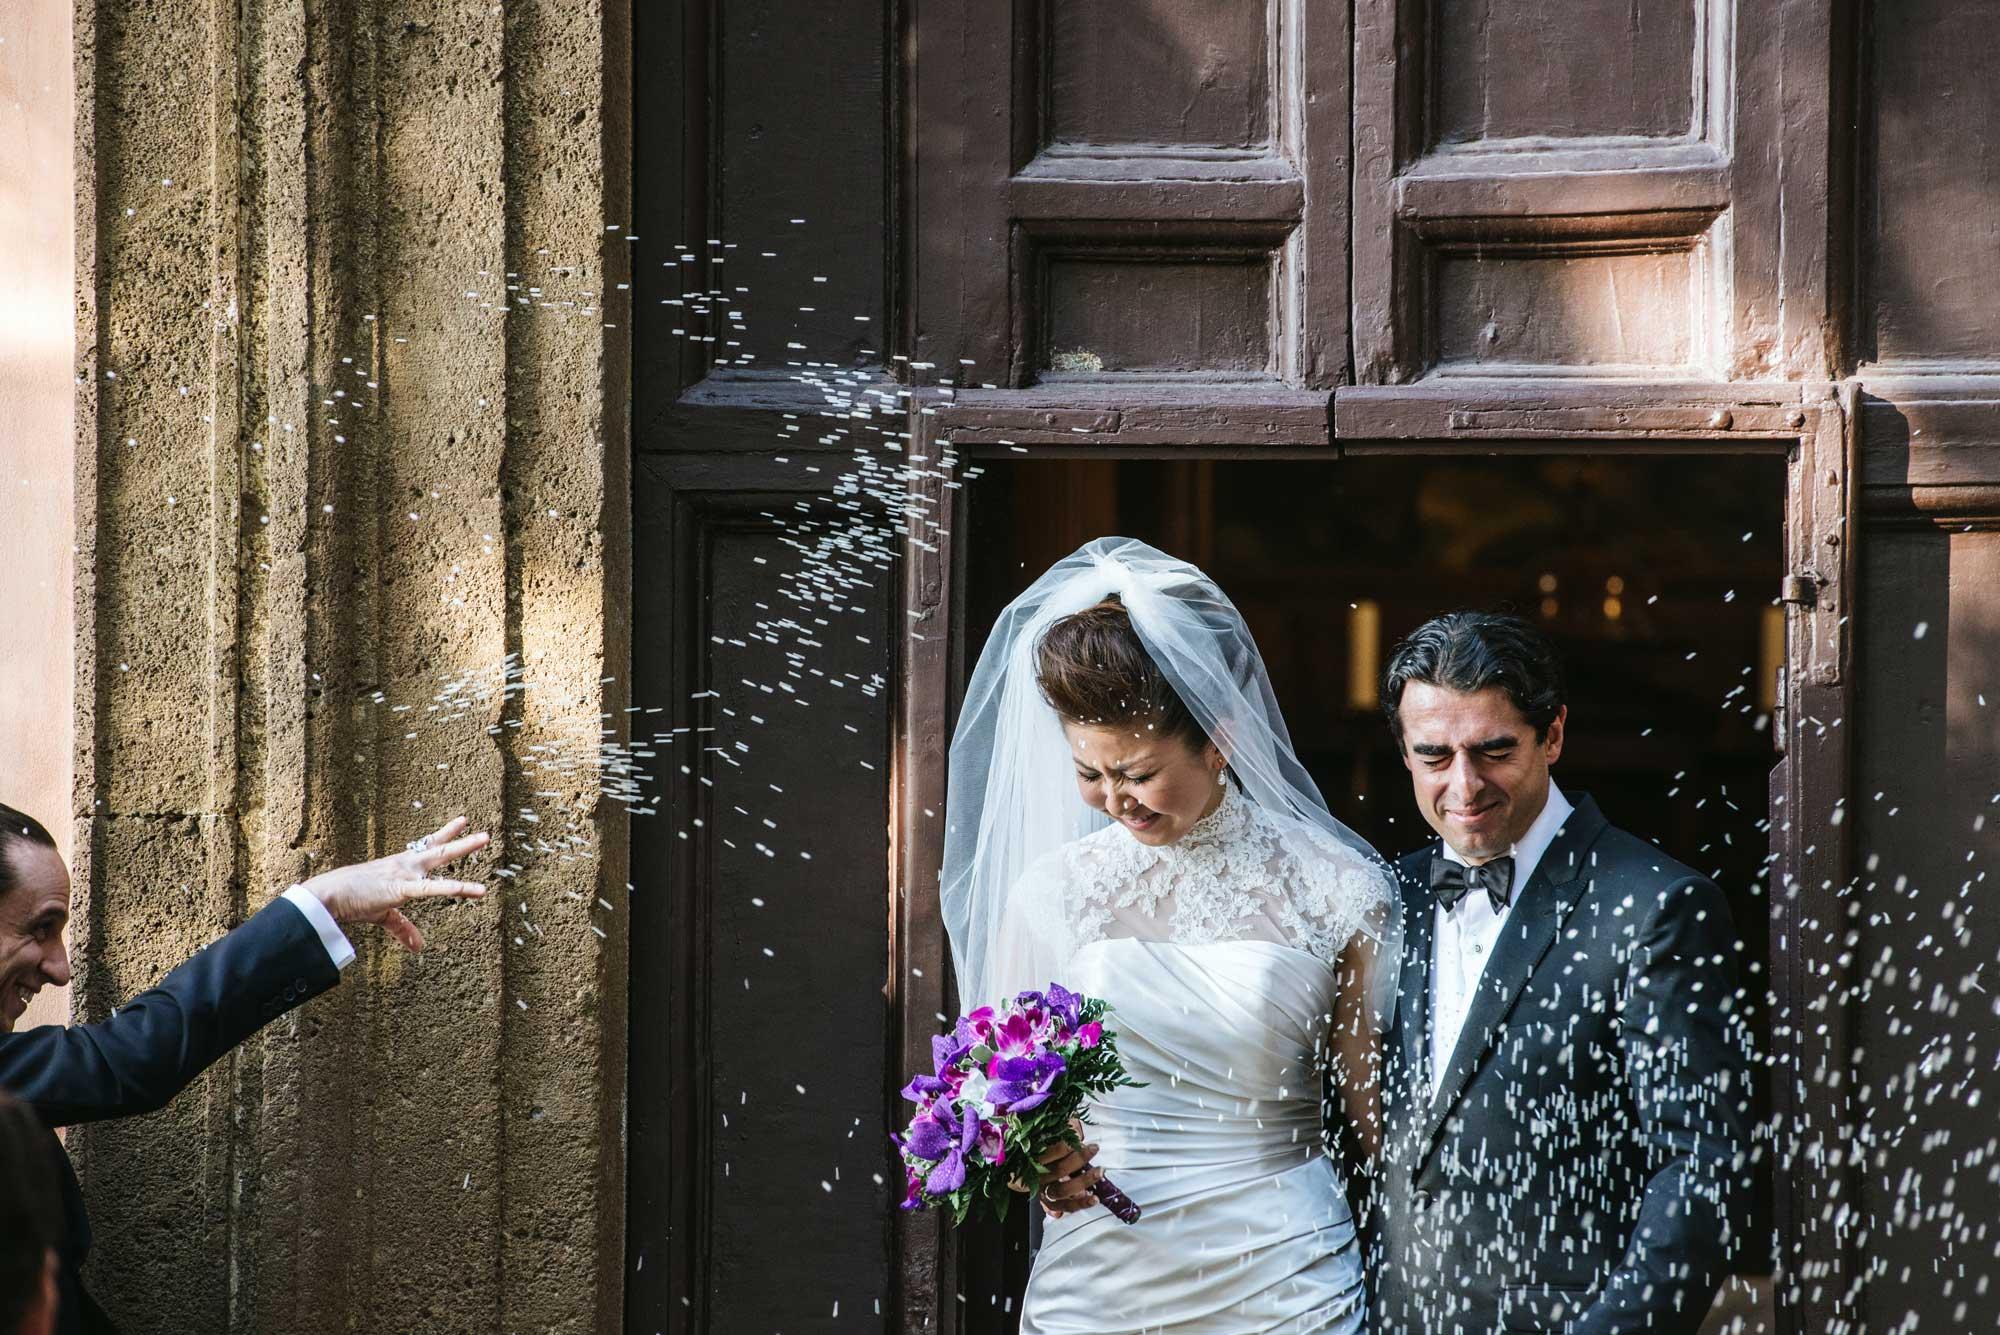 rome-italy-wedding-albertopiroddiphotography-001